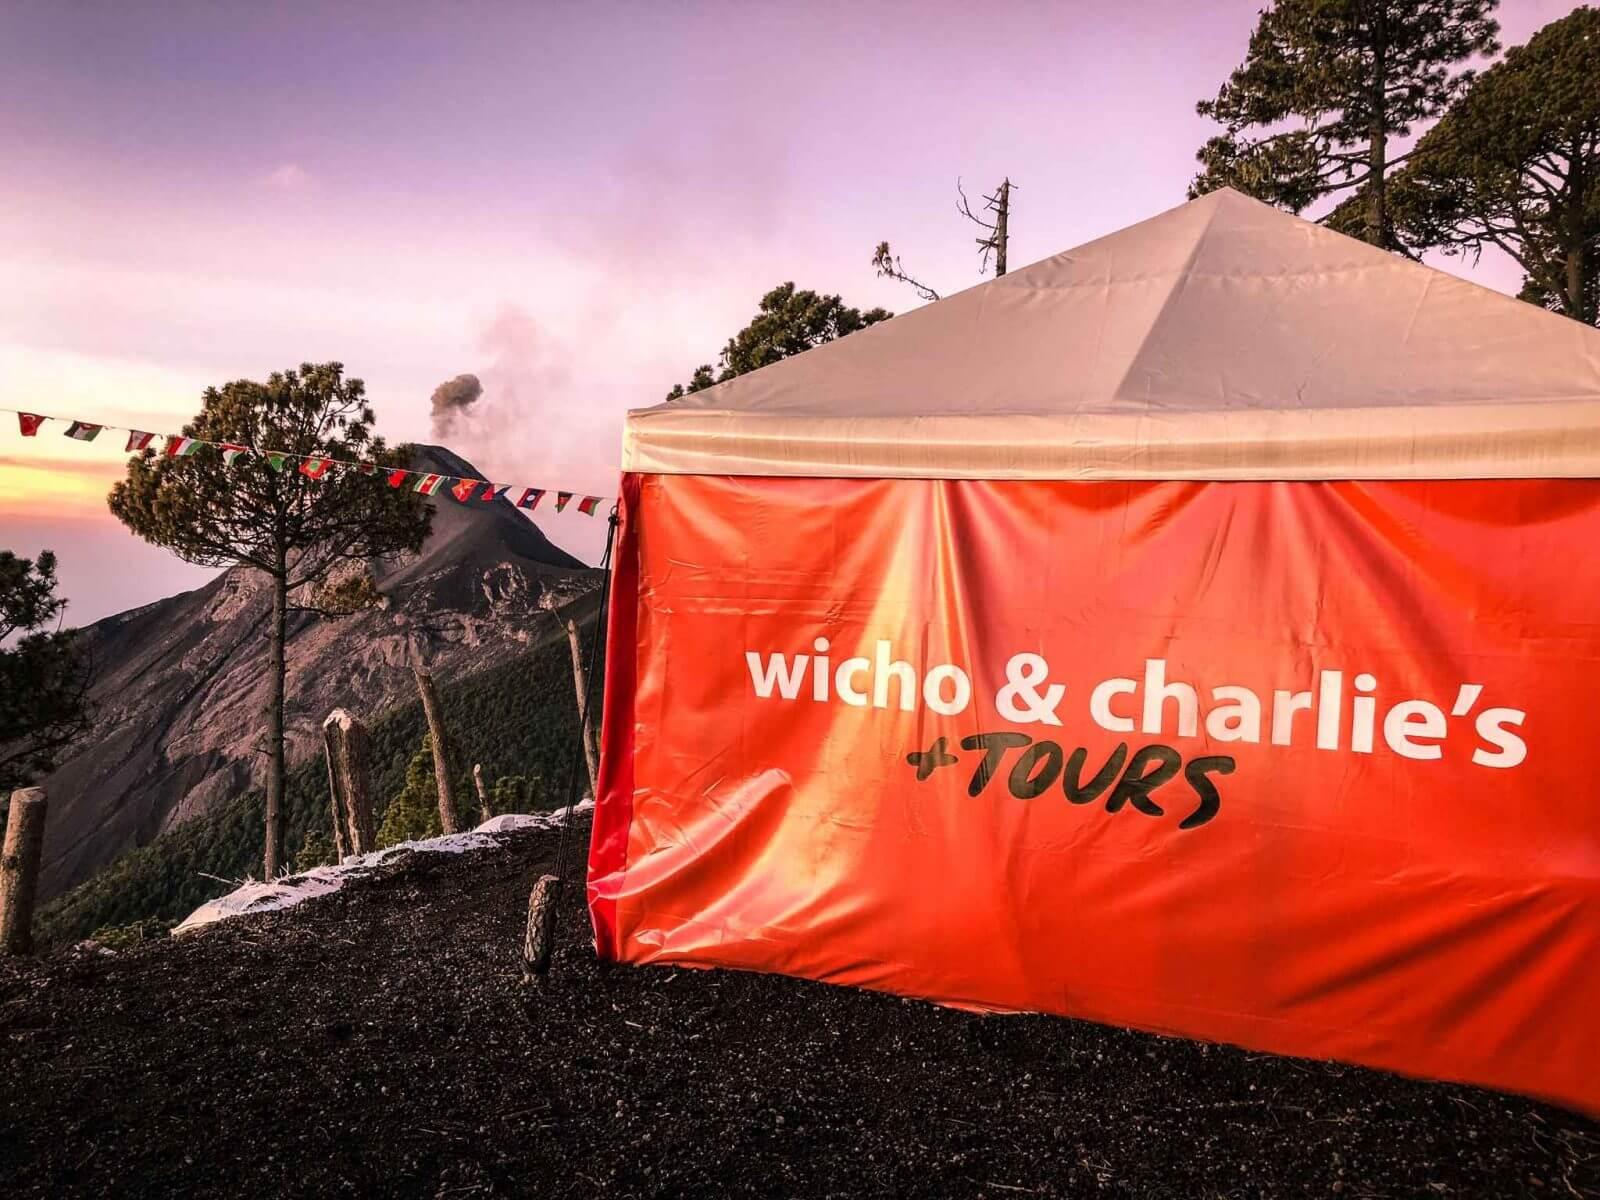 Acatenango Vulkaan beklimmen - Wicho & charlie's tours